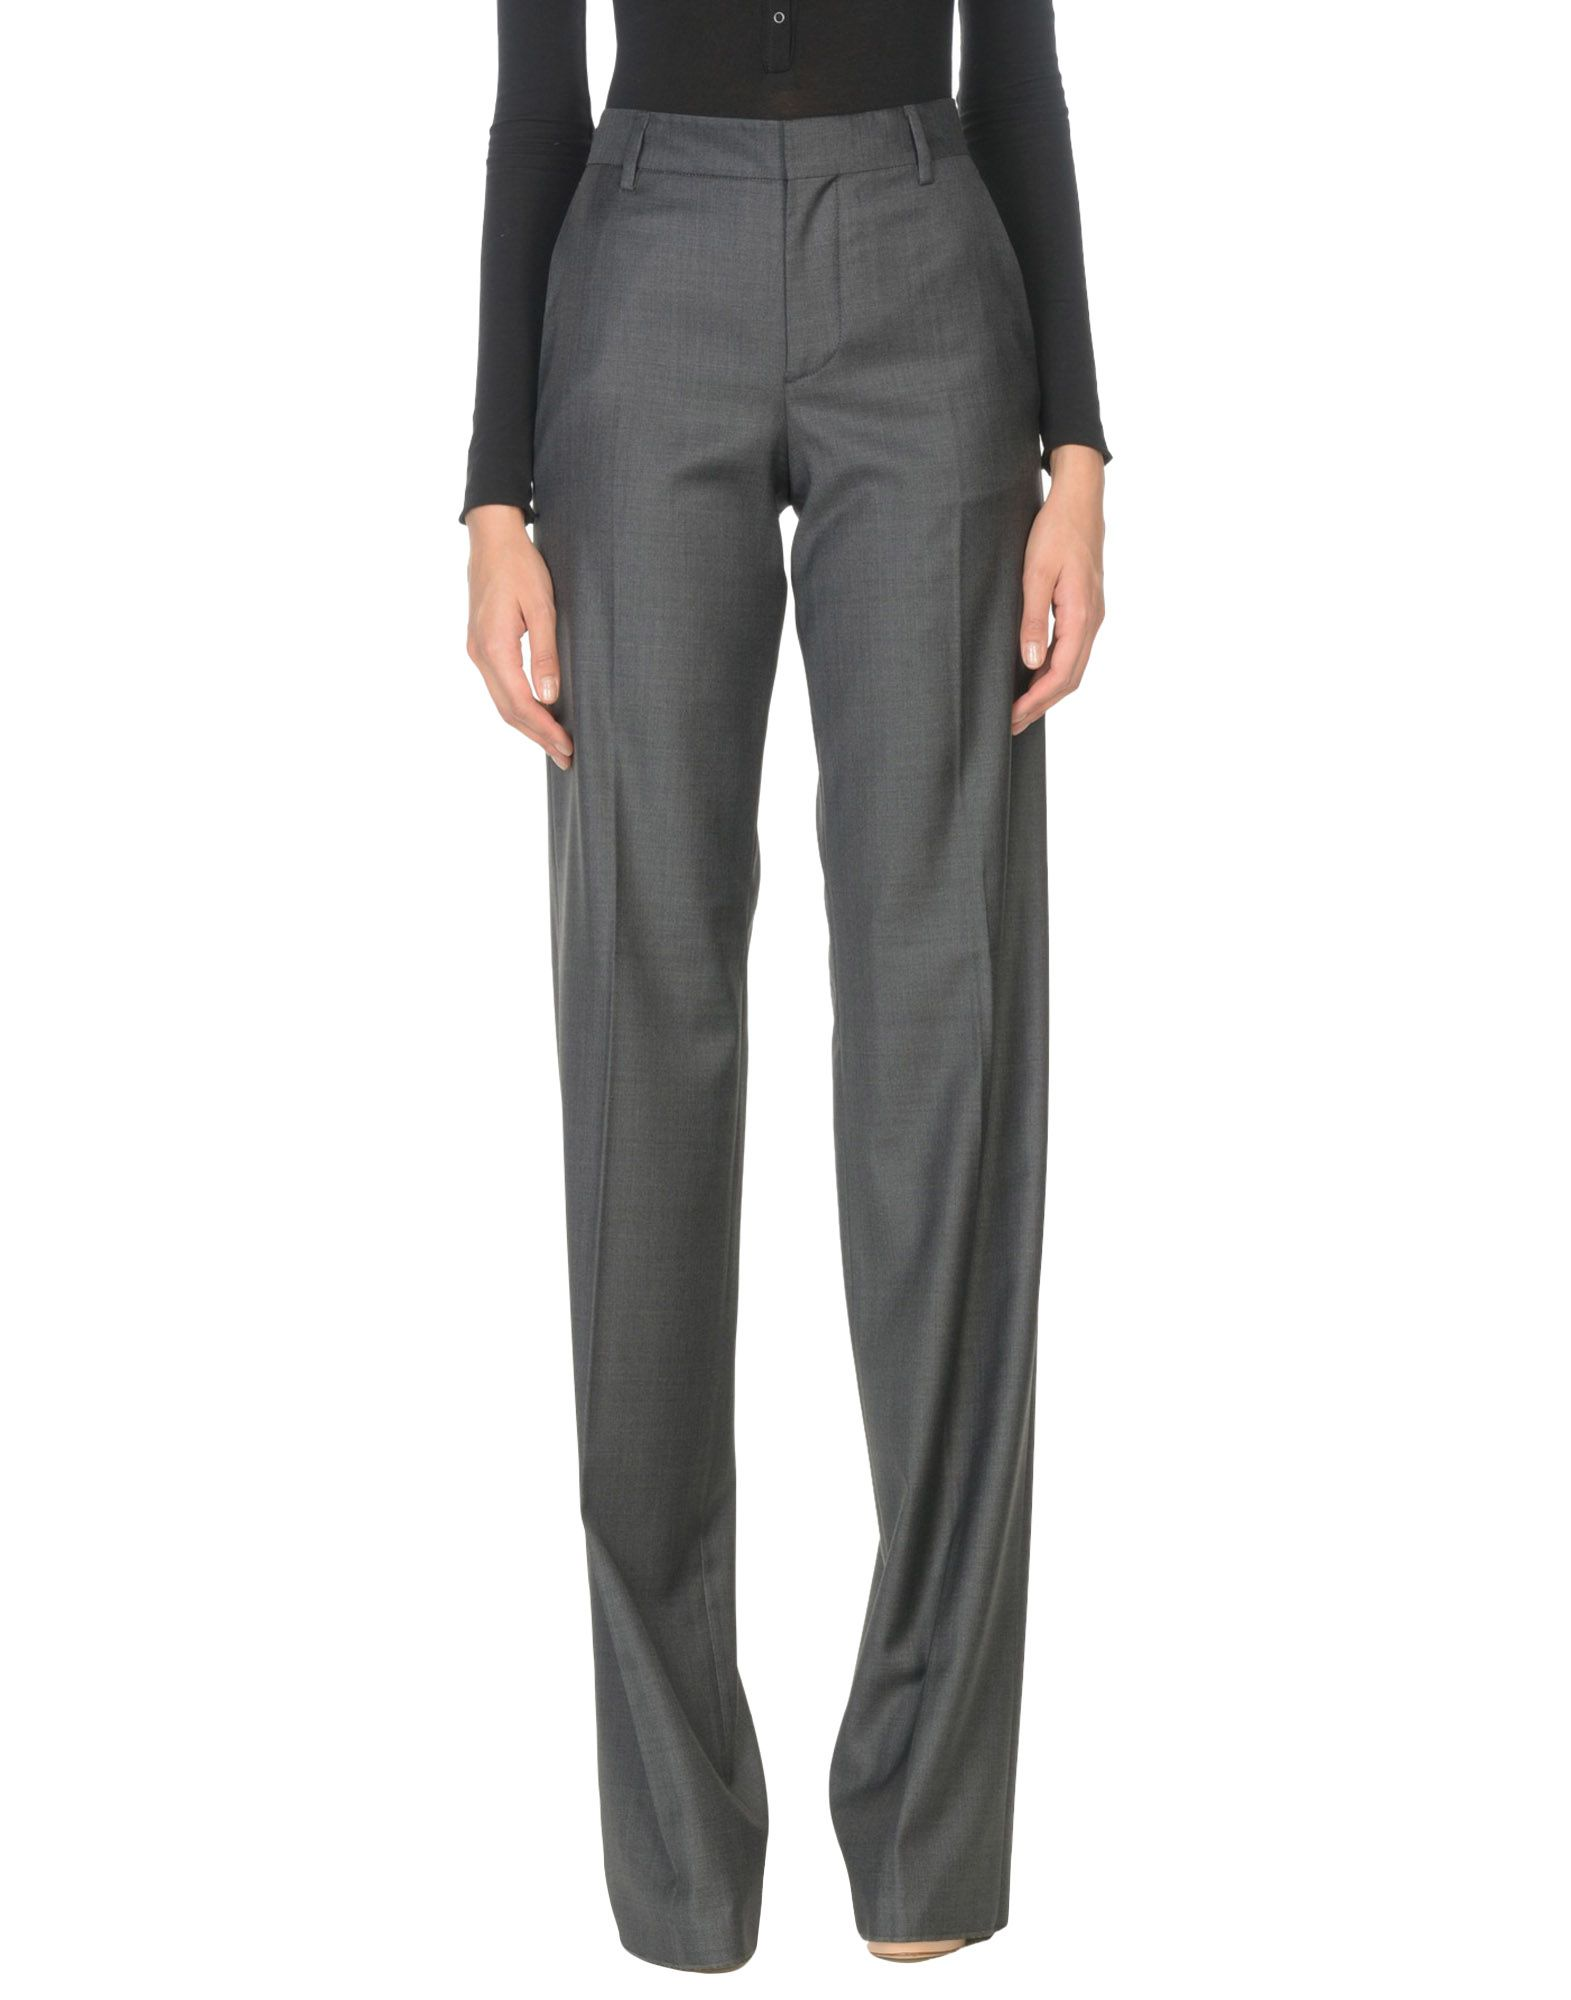 Pantalone Dsquared2 Donna - Acquista online su NocfpnOLP